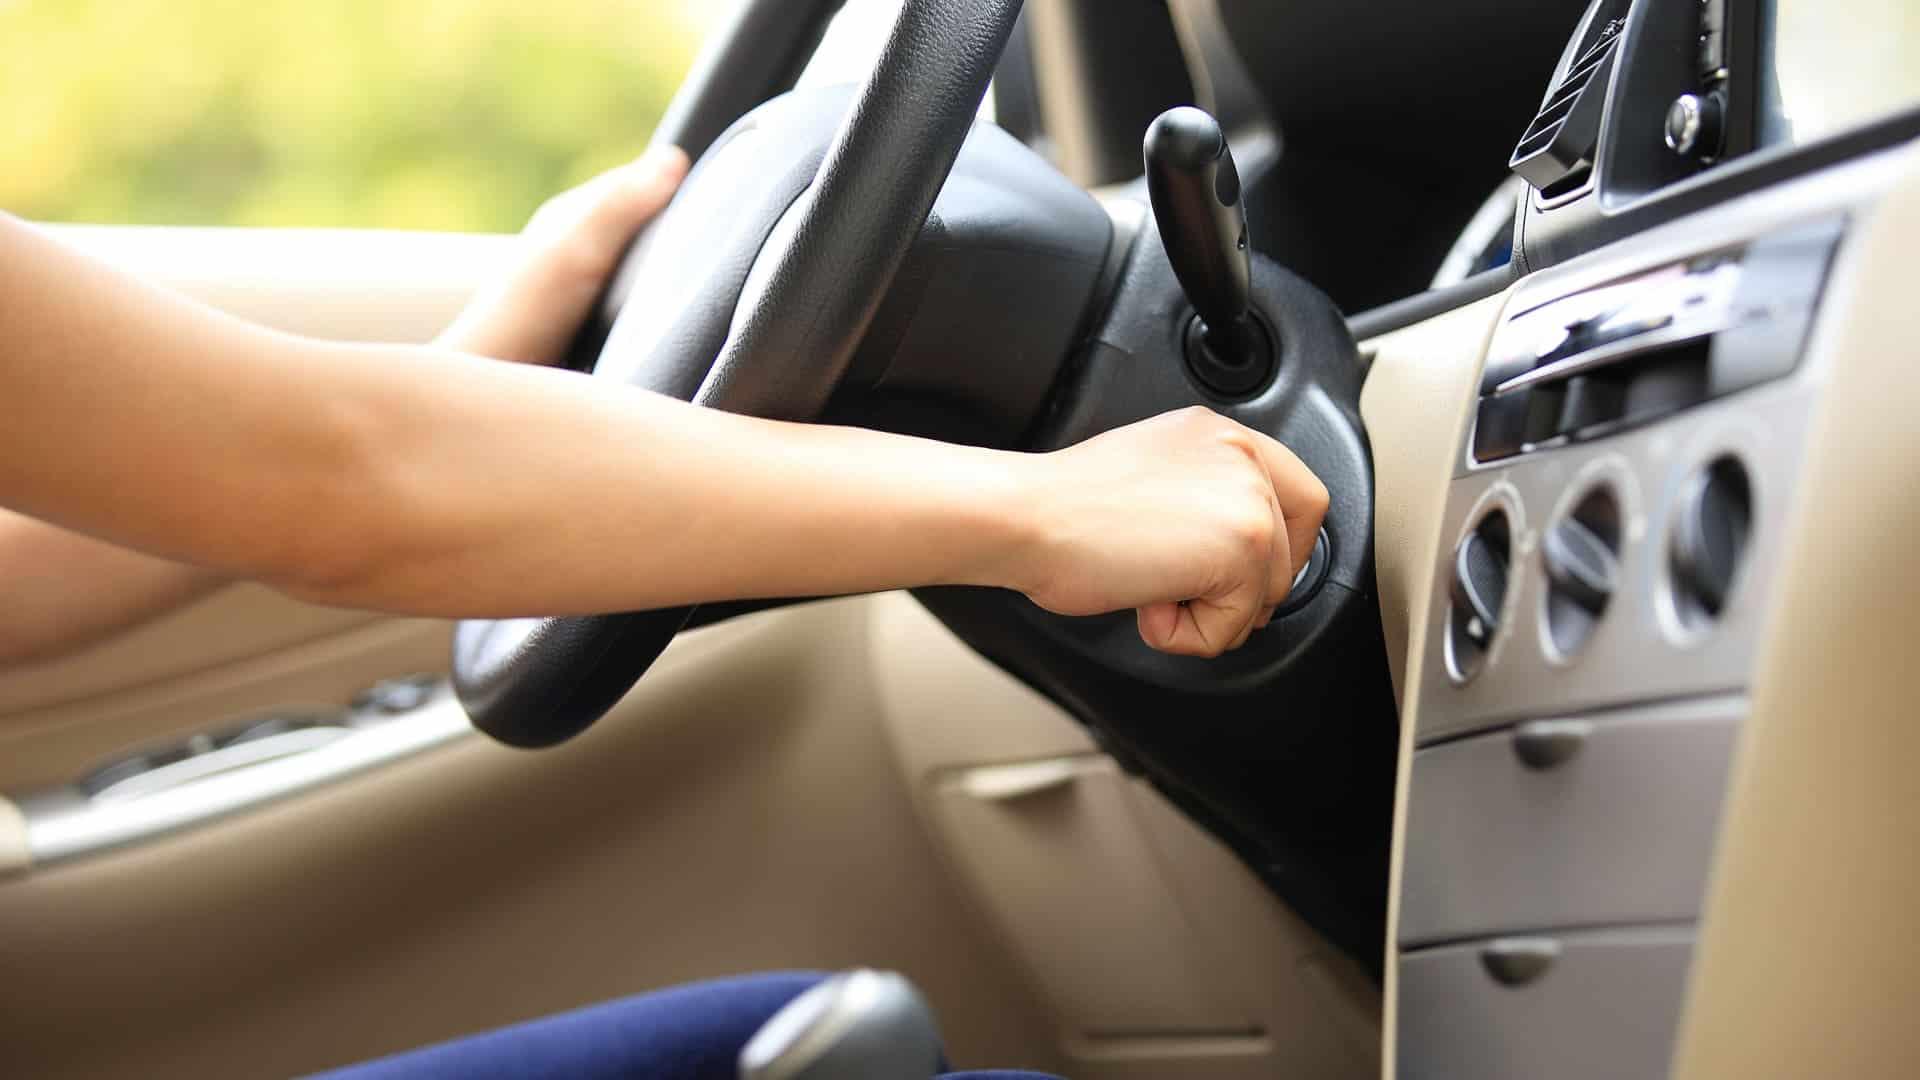 Anti-Theft System Car Won't Start